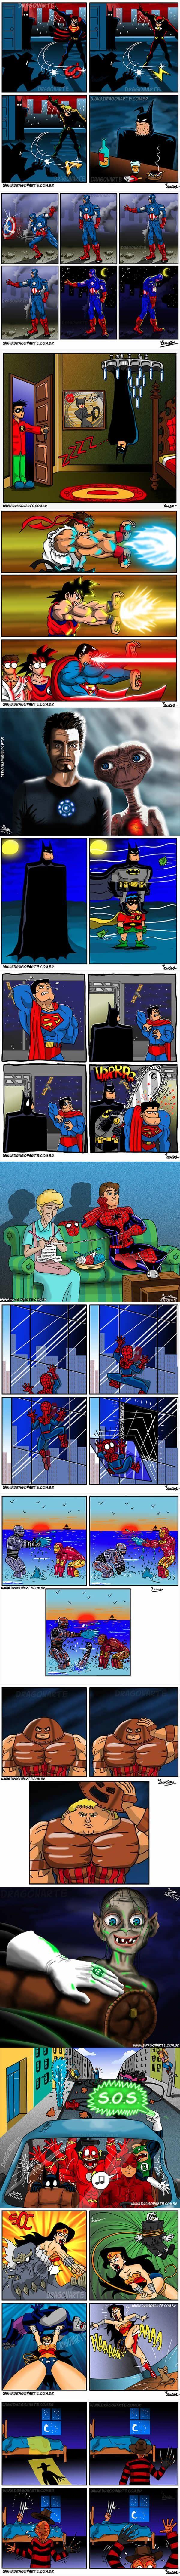 The Funniest Superhero Comics Collection (Part 3):